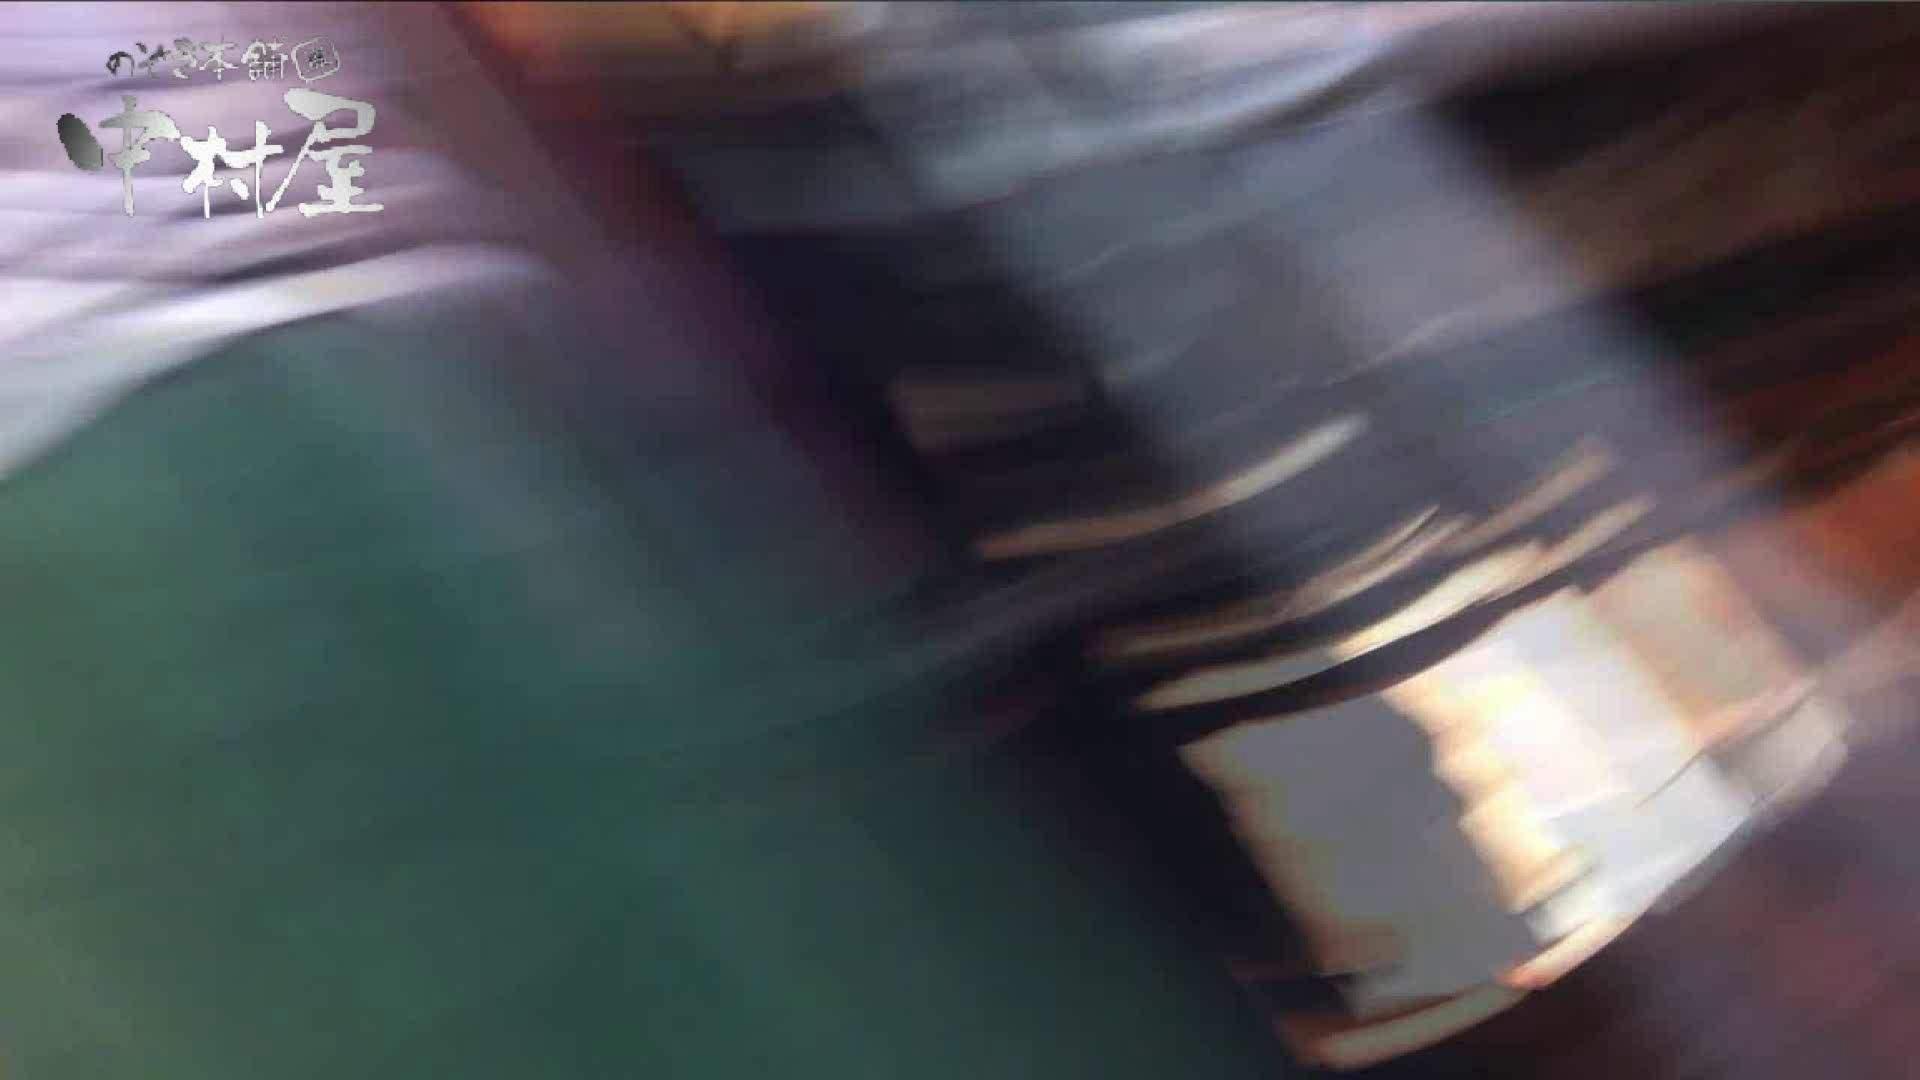 vol.52 美人アパレル胸チラ&パンチラ おとなしそうな店員の胸元にアタック! 美人  94Pix 3